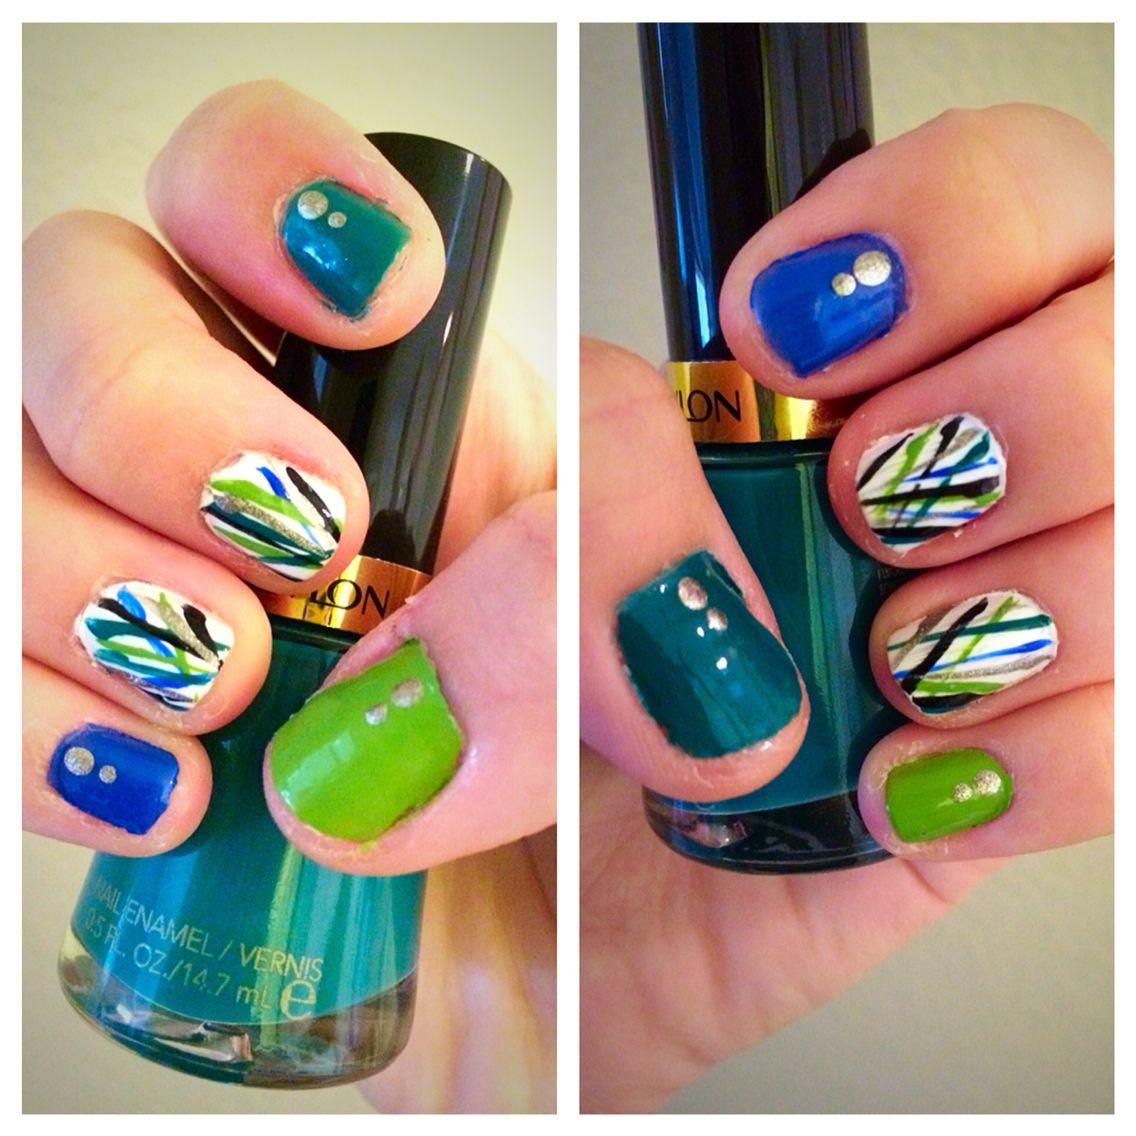 Concrete And Nail Polish Striped Nail Art: Blue, Green, Black And Silver Stripe Nails. Used Revlon